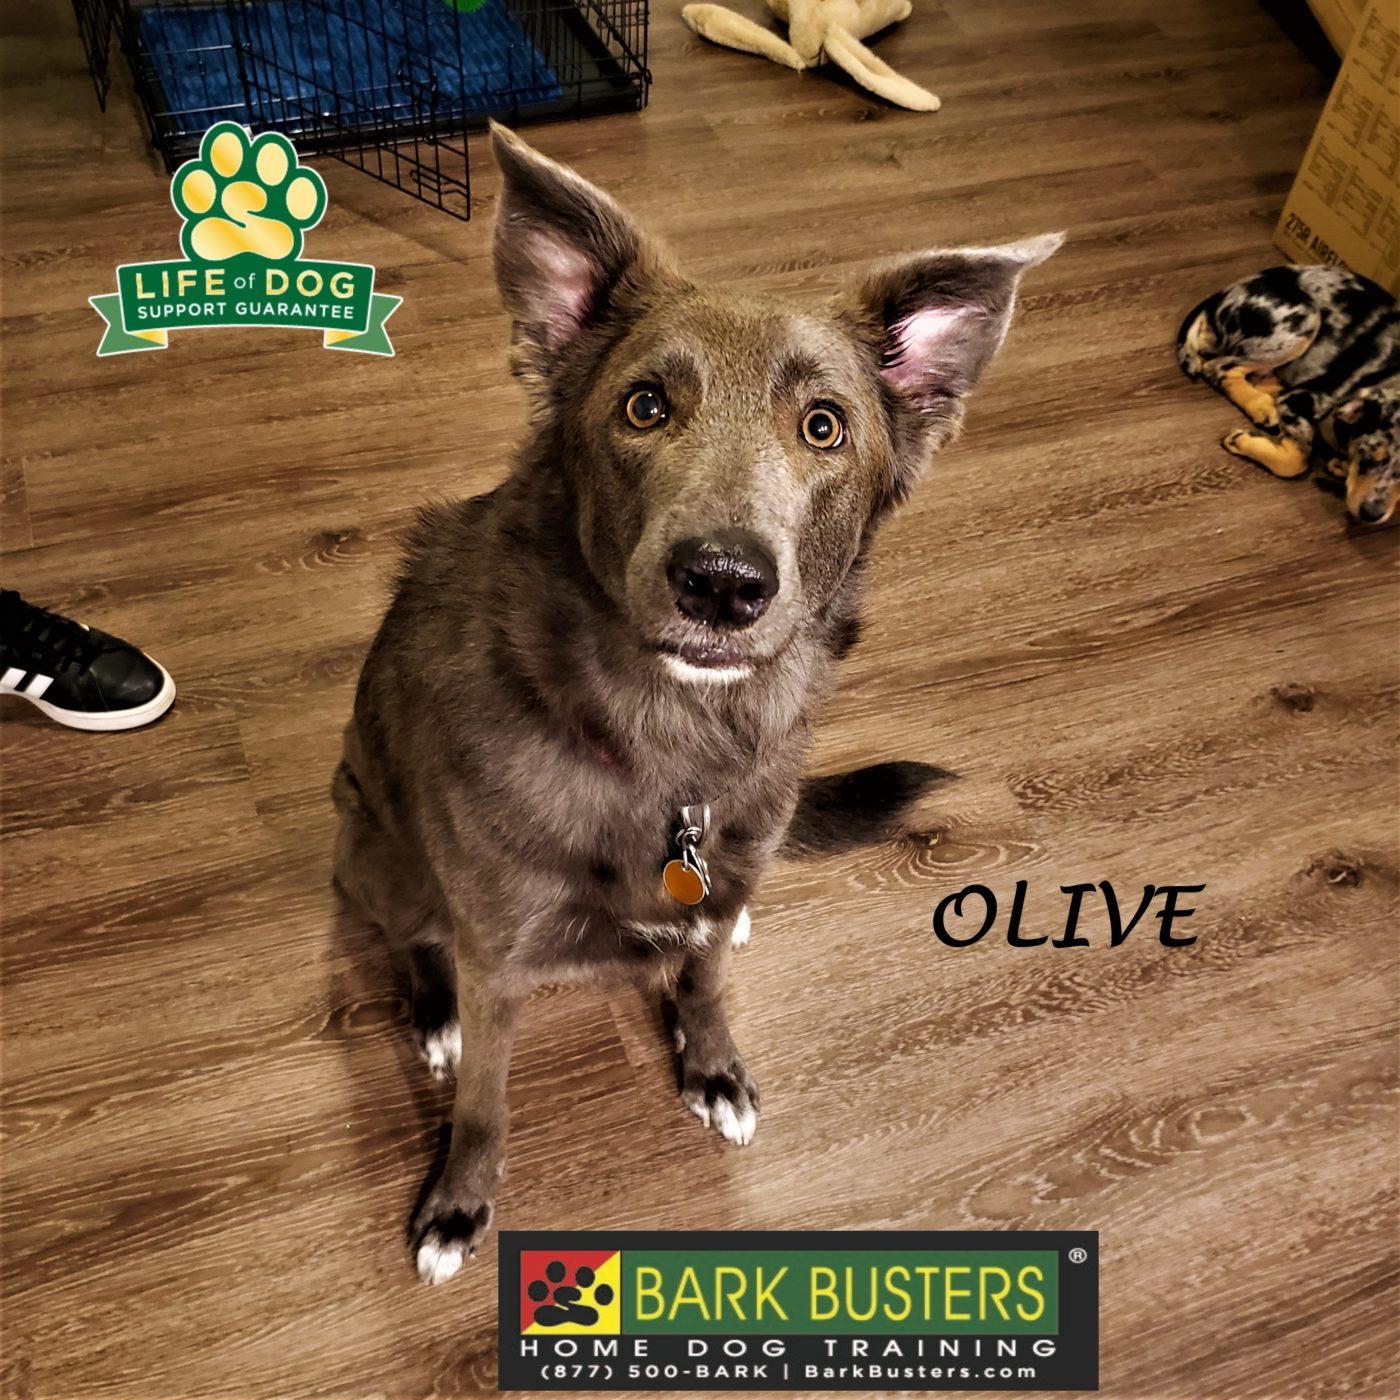 #shepherdmix #siblingrivalry #anxiousdog #dogtrainingdelvalle #dogtrainernearme #barkbusters #speakdog #inhomedogtraining